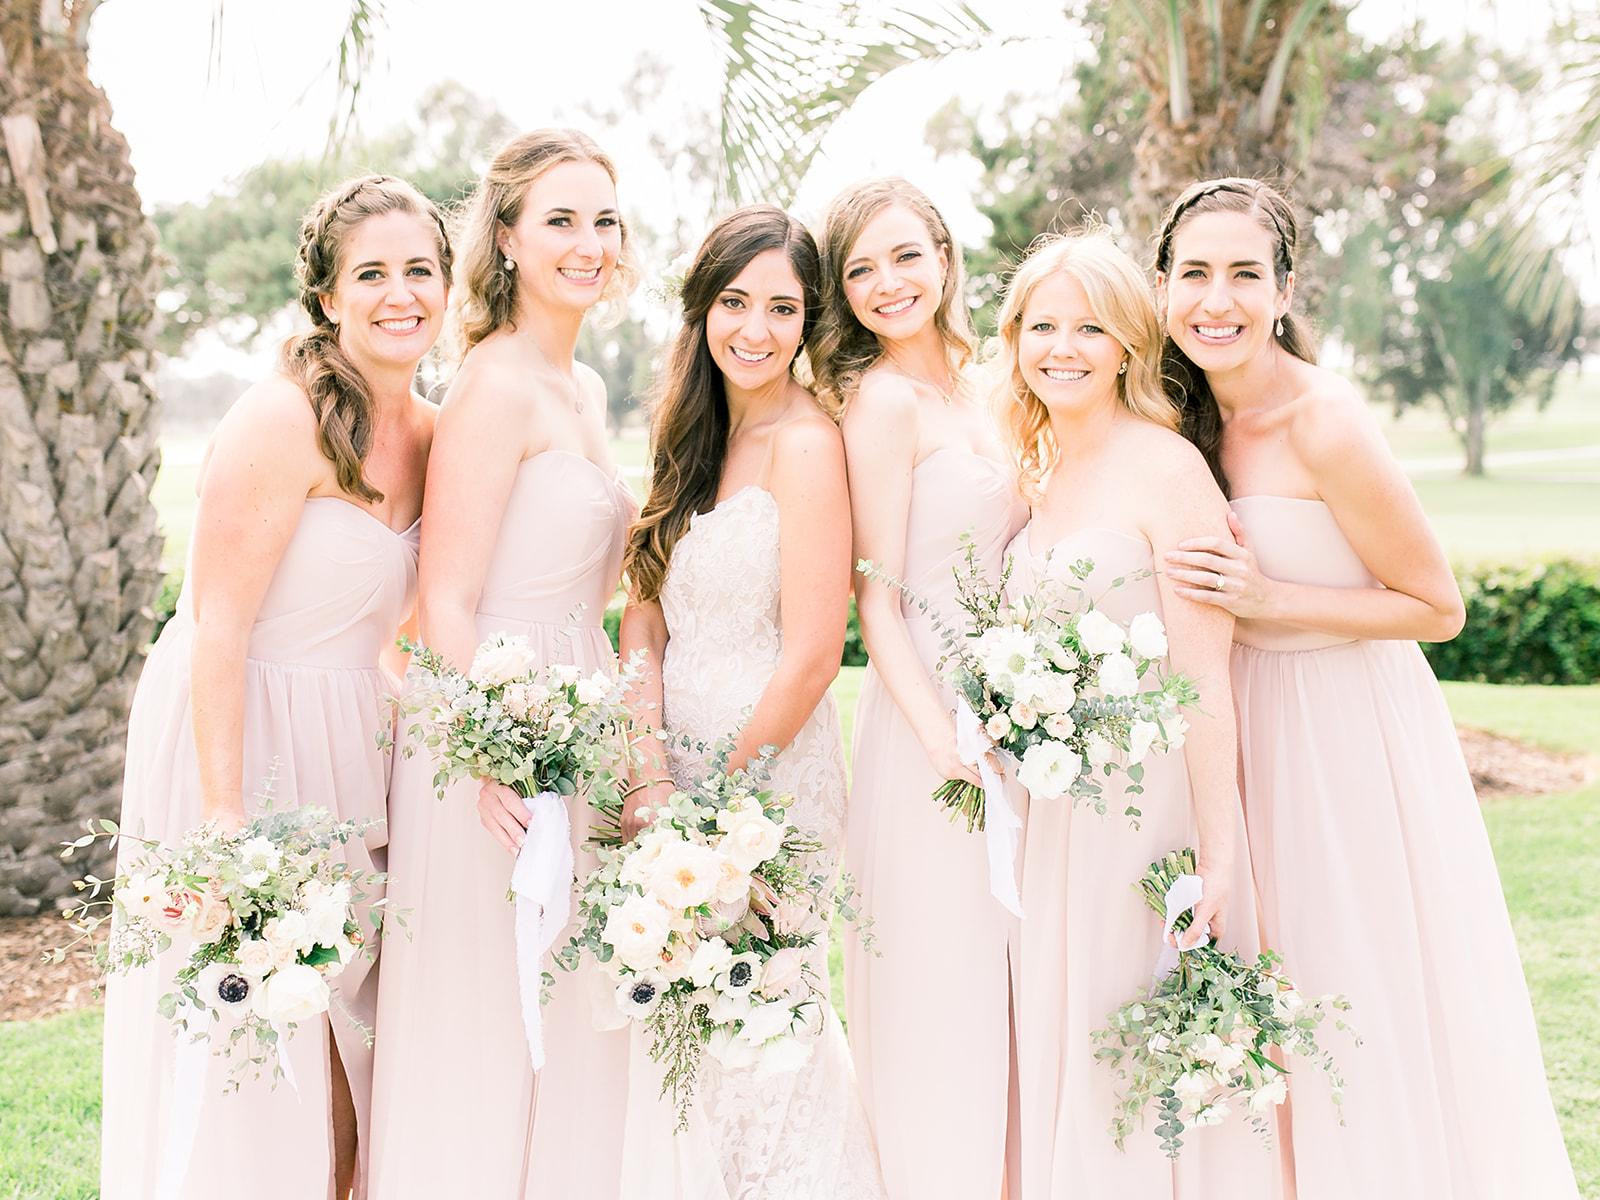 Melissa-Dave-Wedding-358.jpg